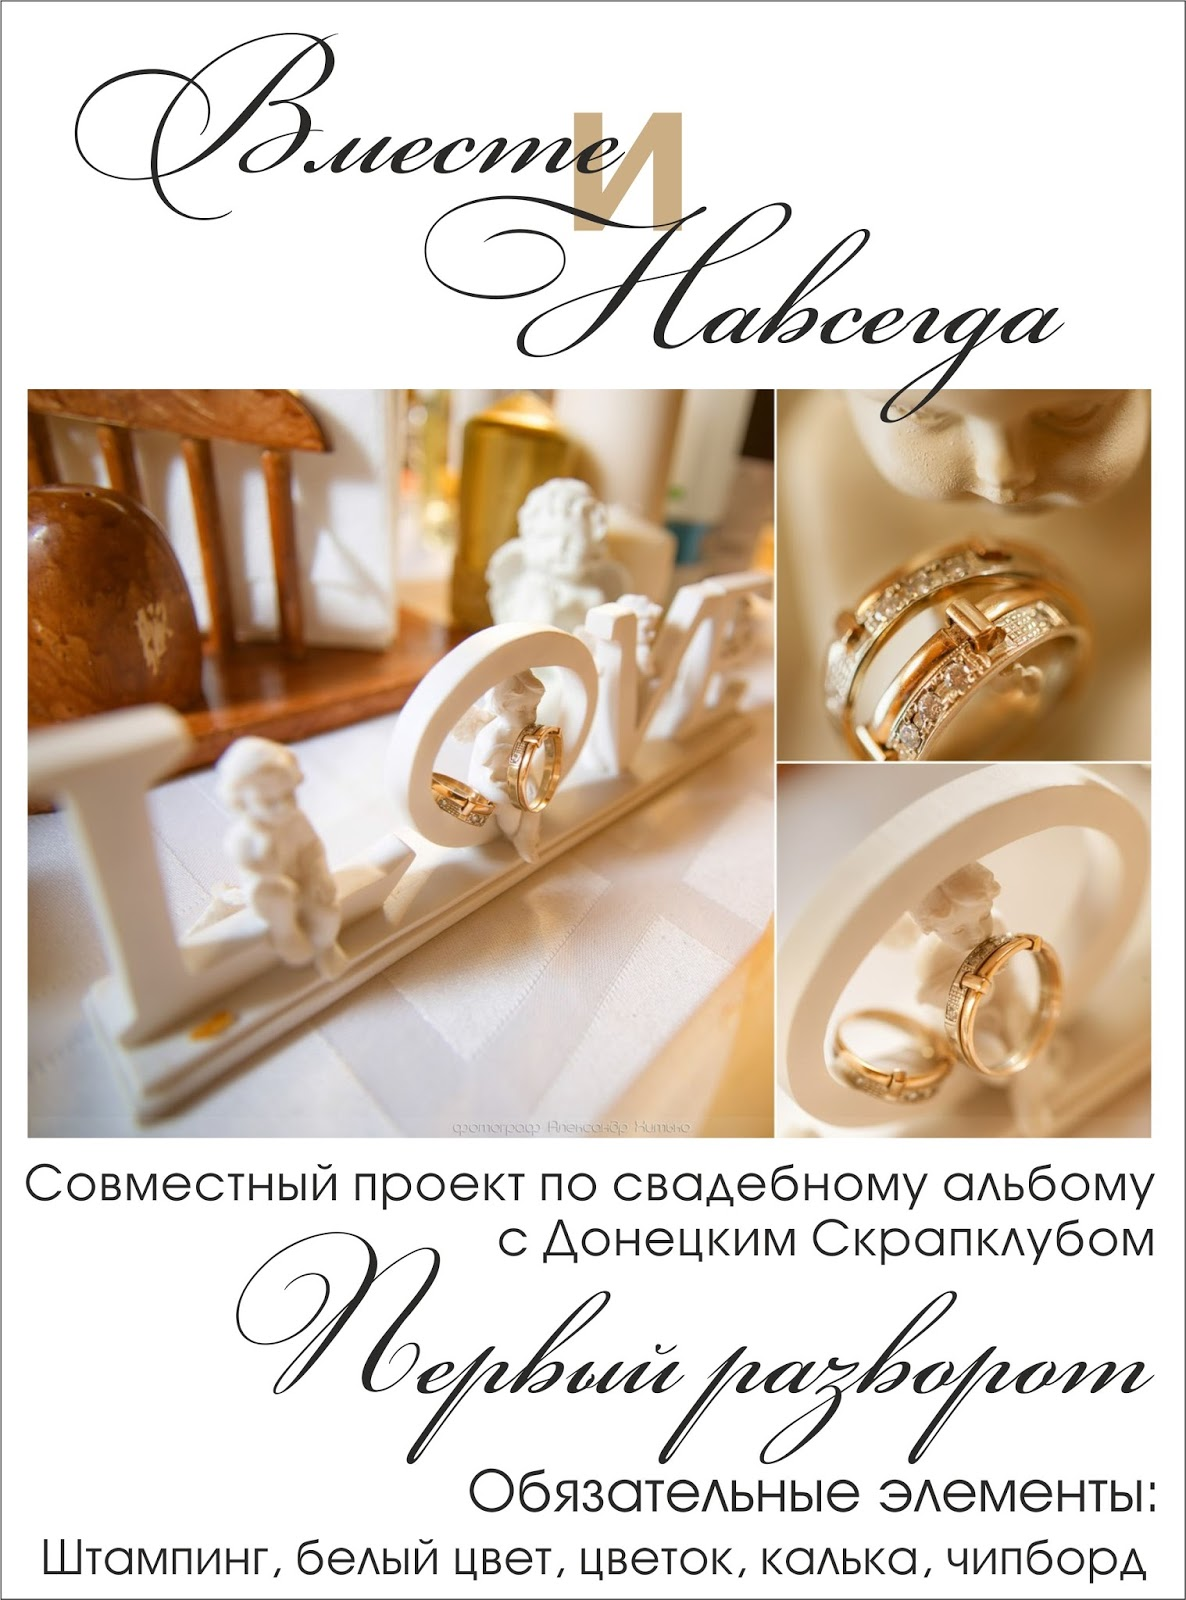 http://scrapclub-donetsk.blogspot.ru/2015/03/i.html